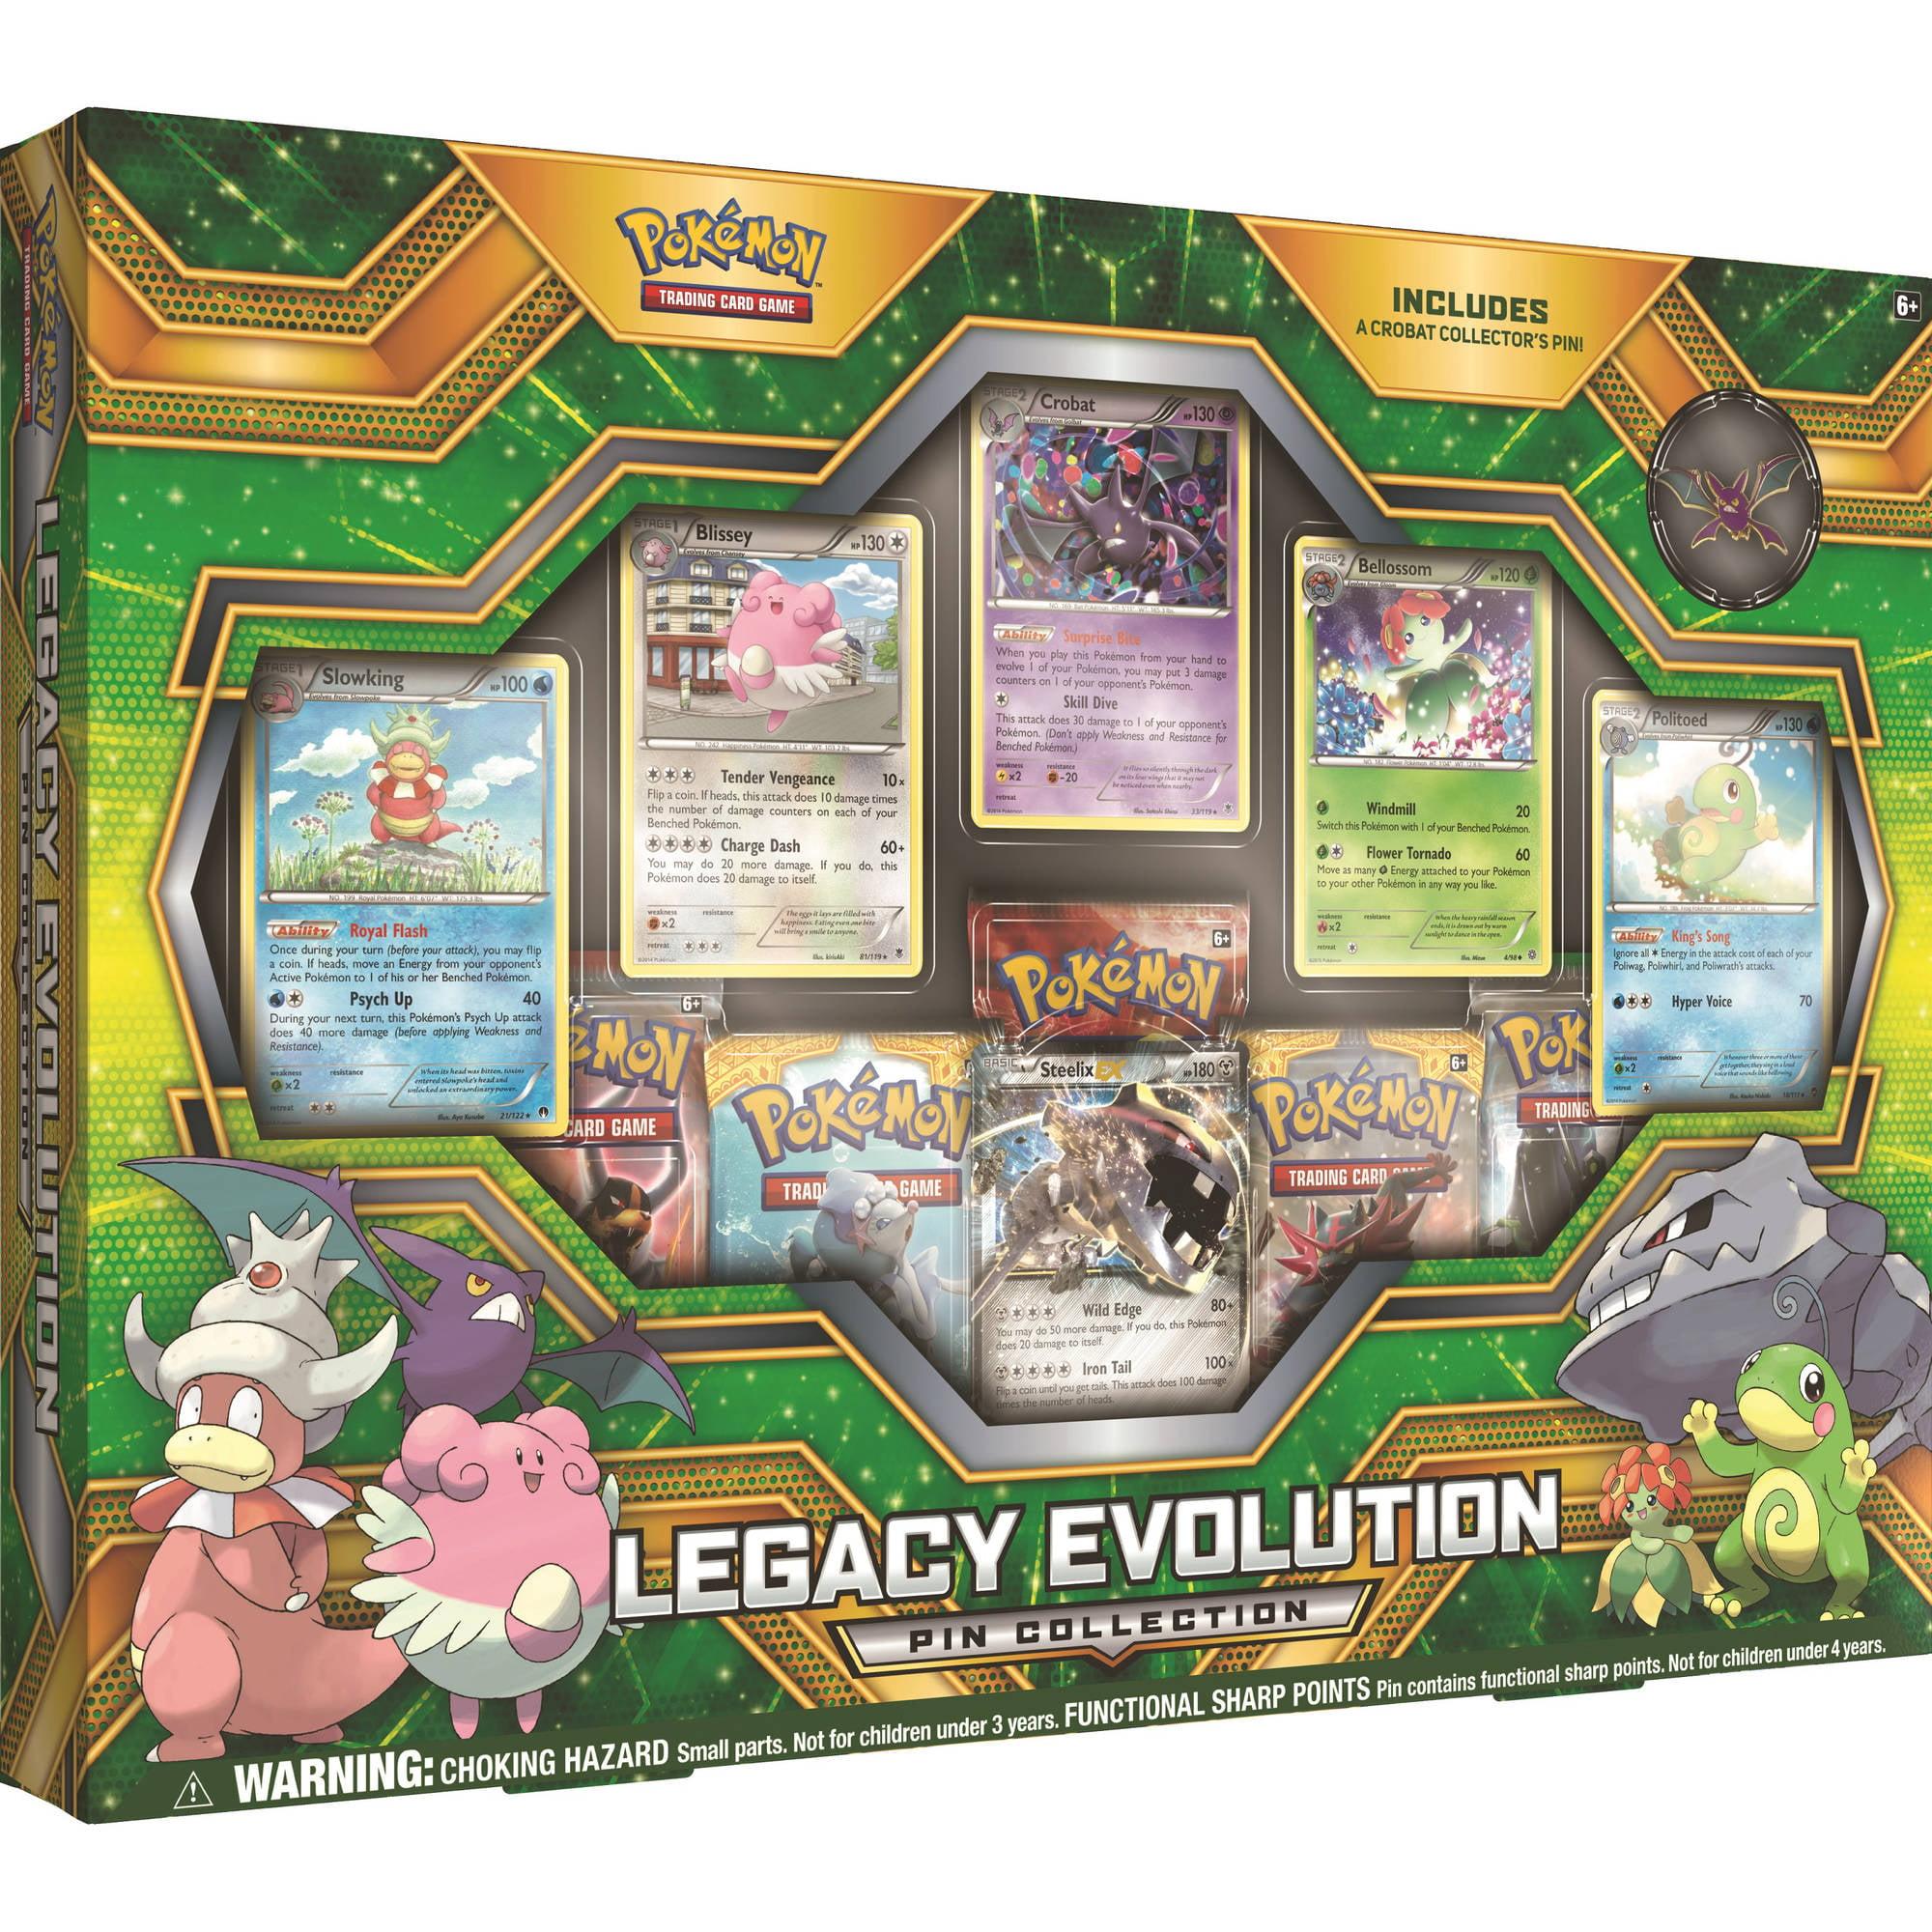 Pokemon Legacy Evolution Pin Collection Box by Pokemon